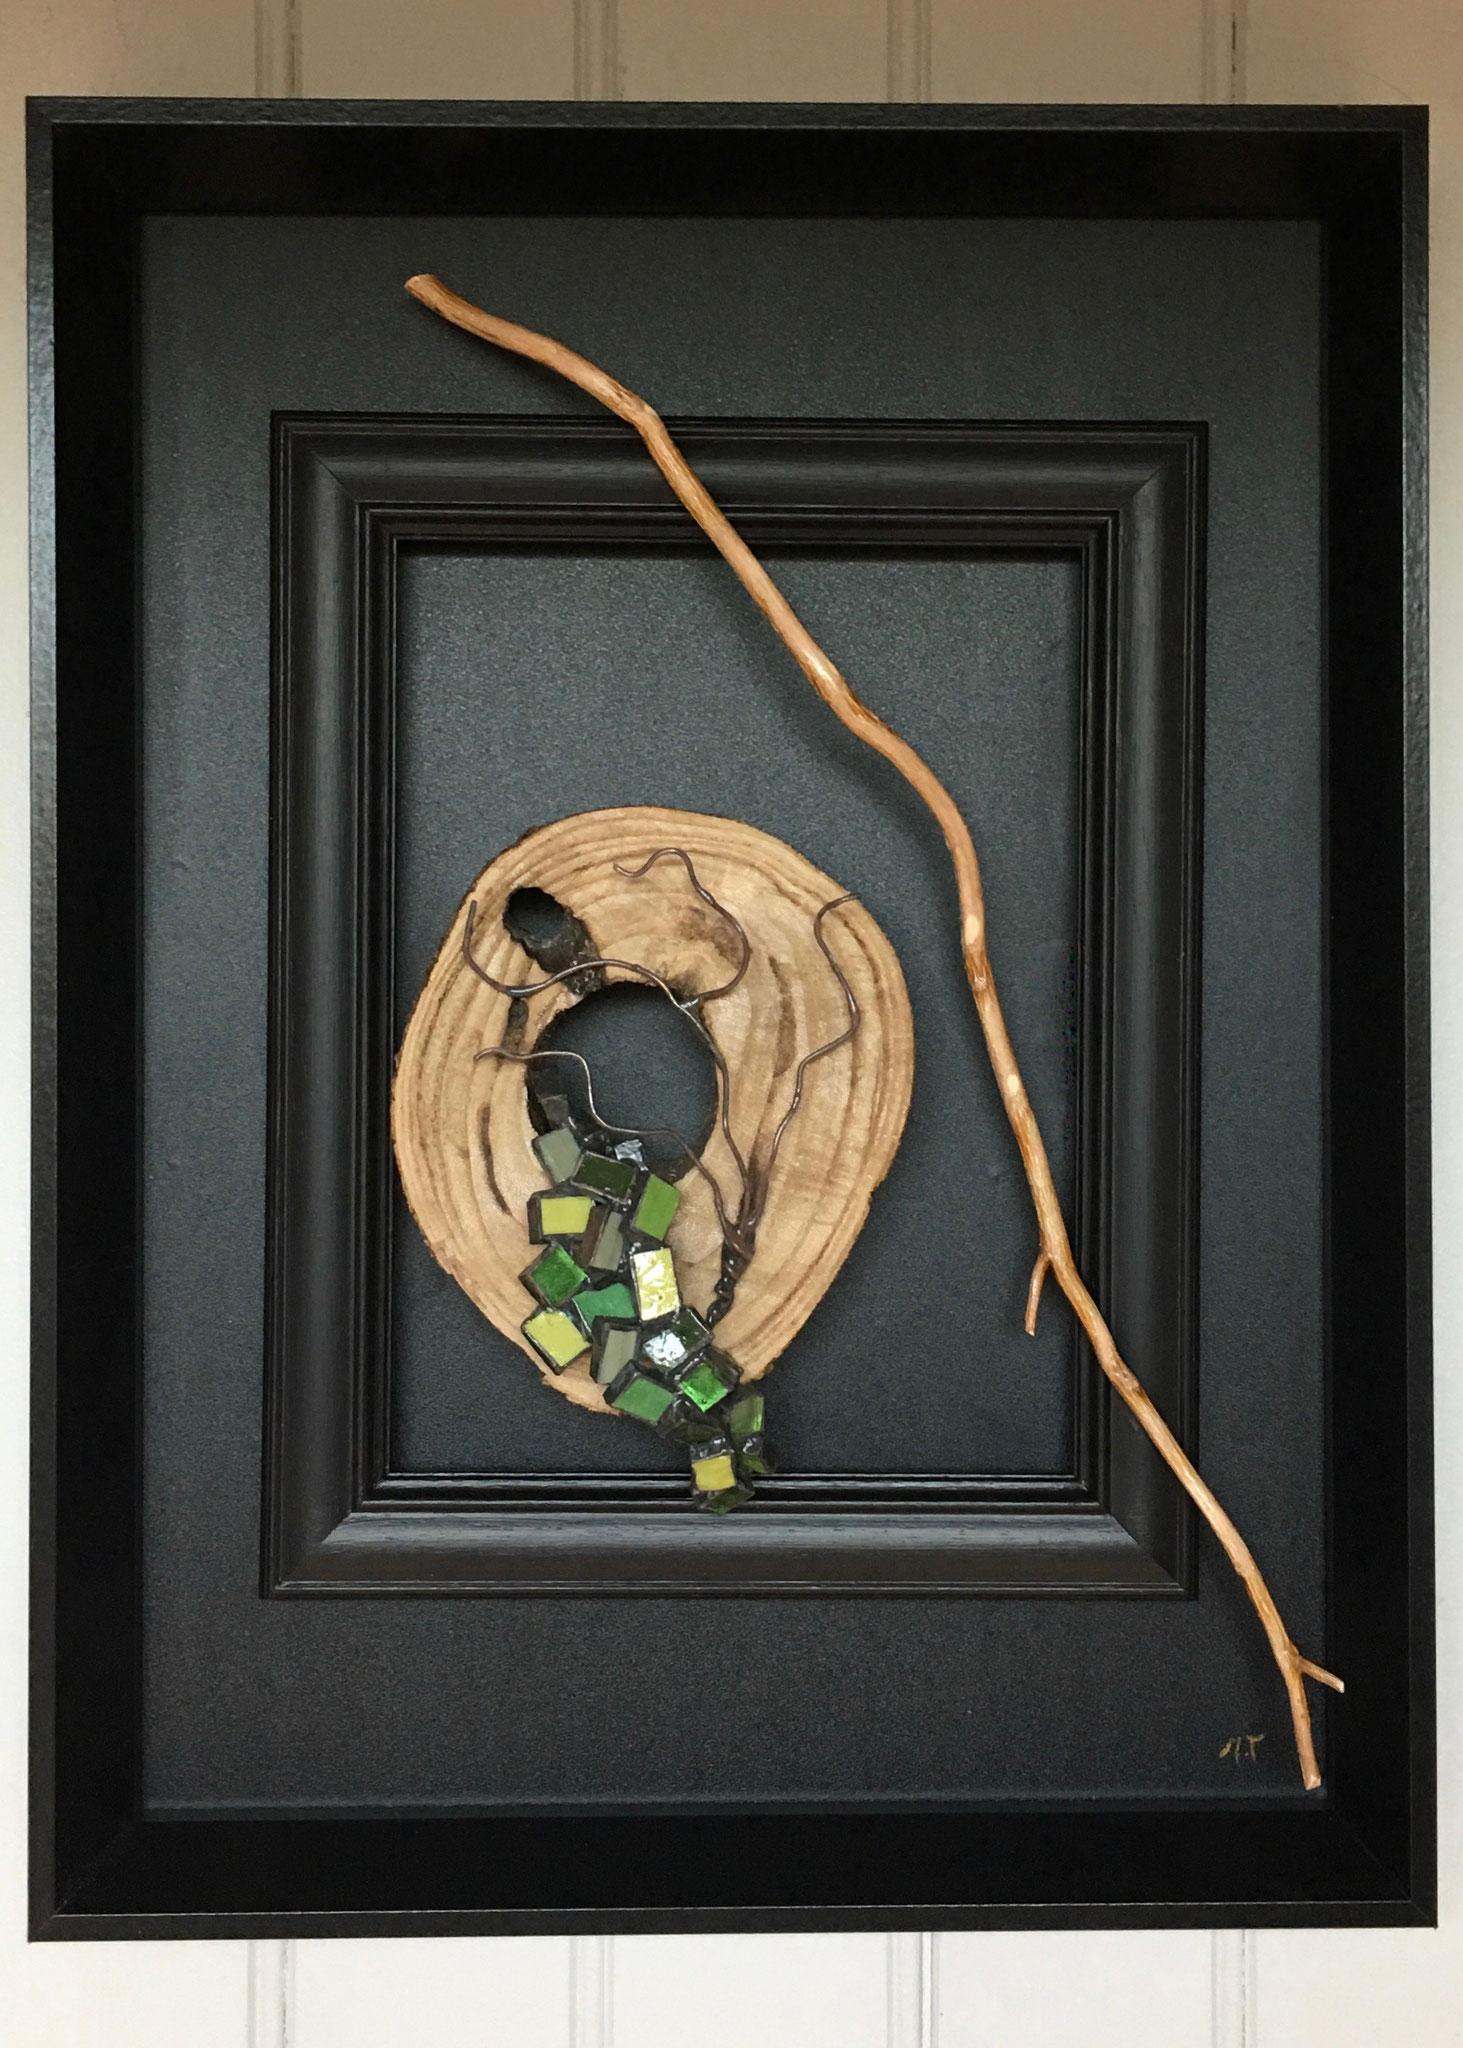 Tableau rondin de bois et cascade tesselles de verre Murano